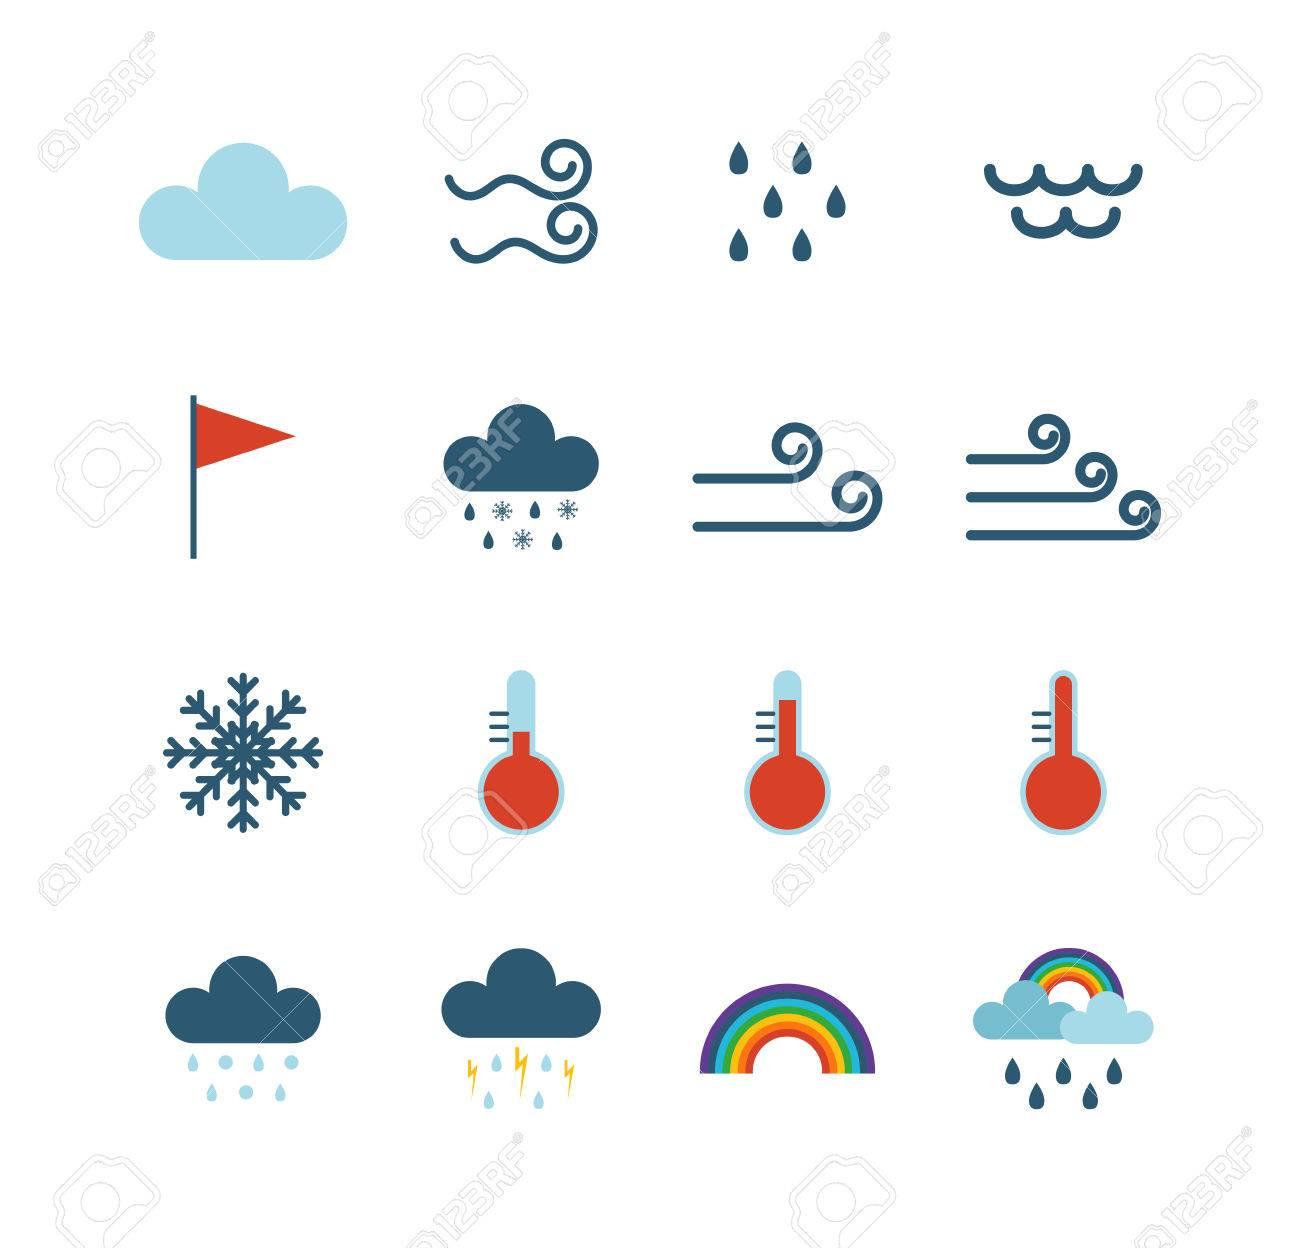 Free download clip art. Fog clipart cold cloud